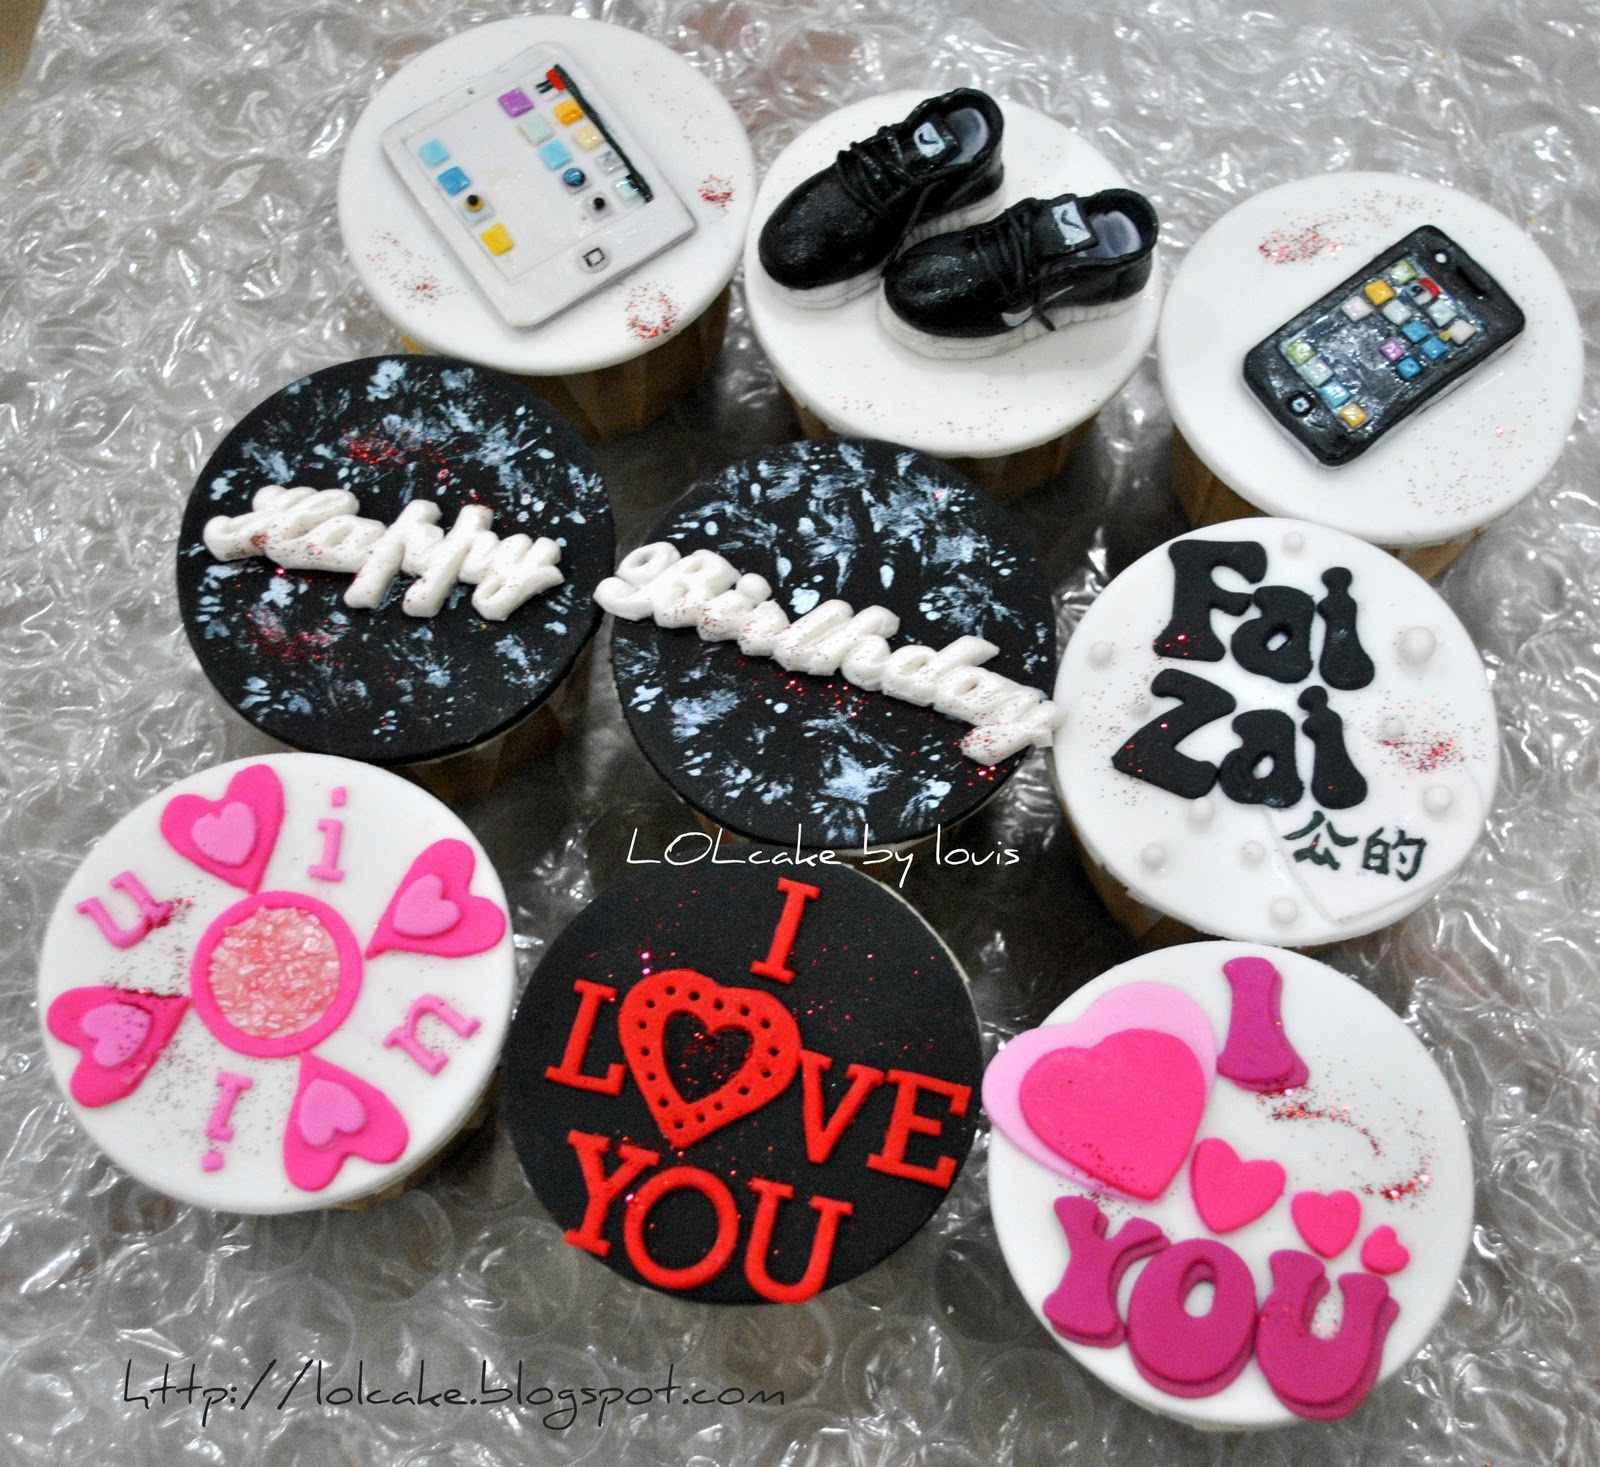 boyfriend cupcakes - photo #9